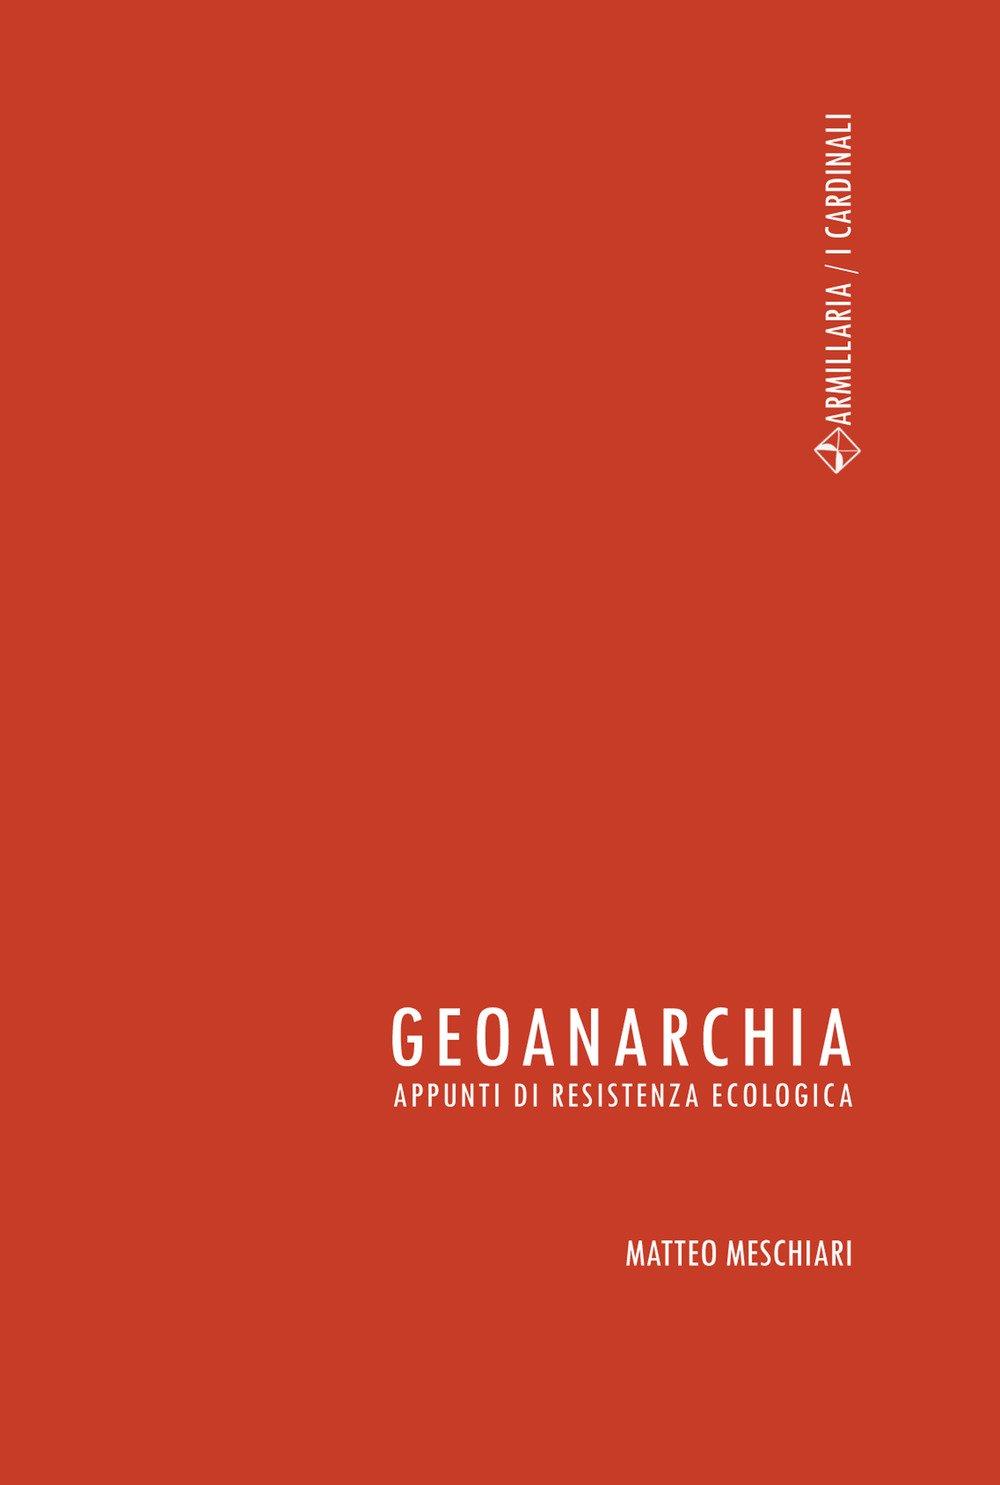 Leg.Geo – Geoanarchia di Matteo Meschiari